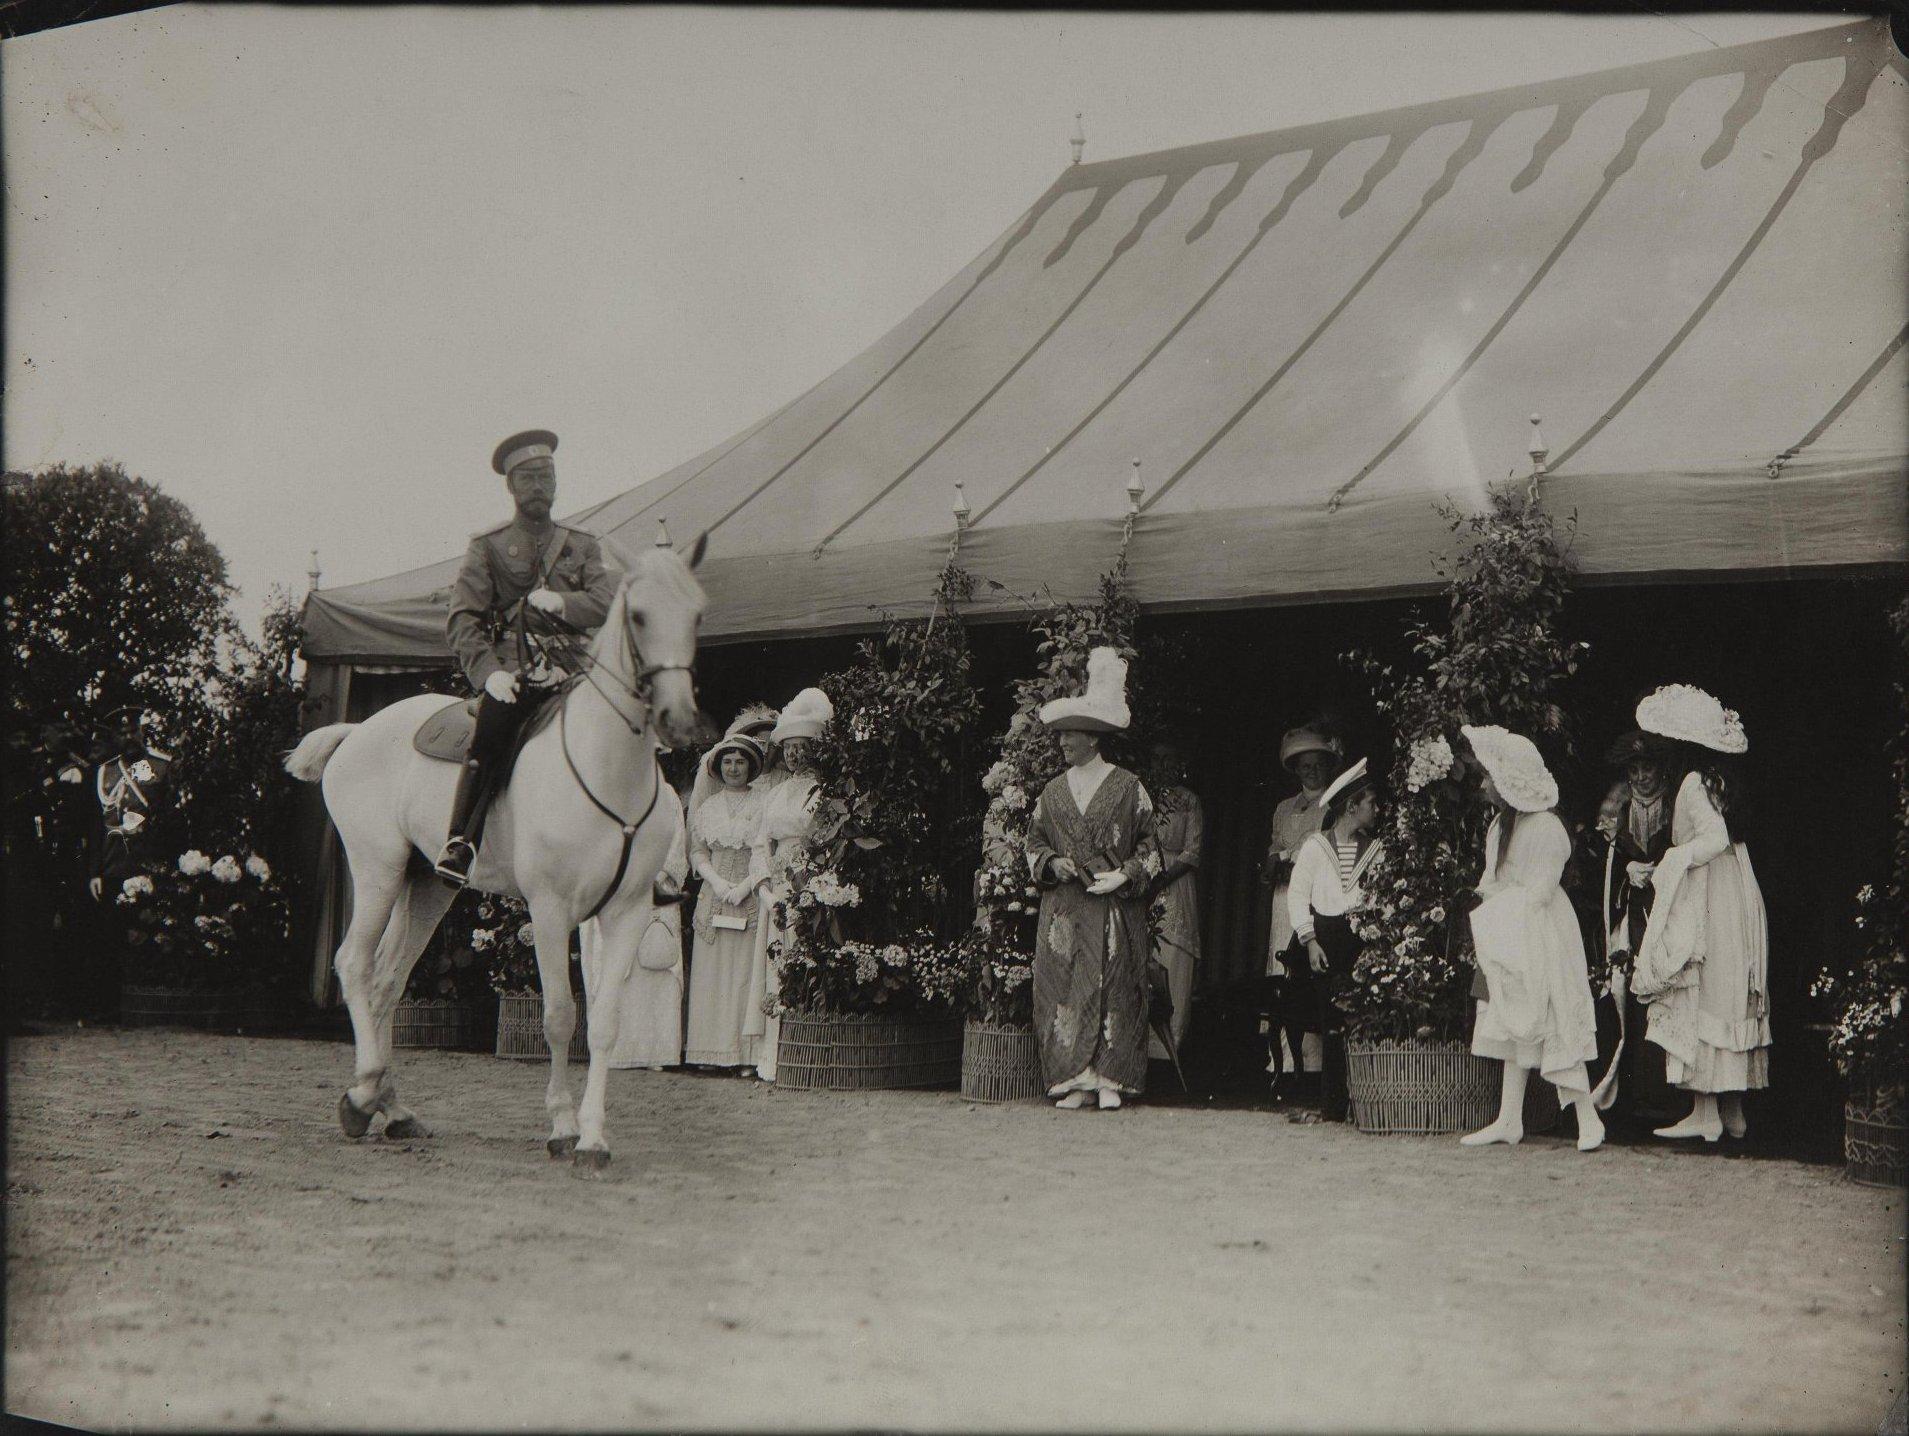 1900-е. Император Николай II на коне, под навесом его семья и родственники.jpg